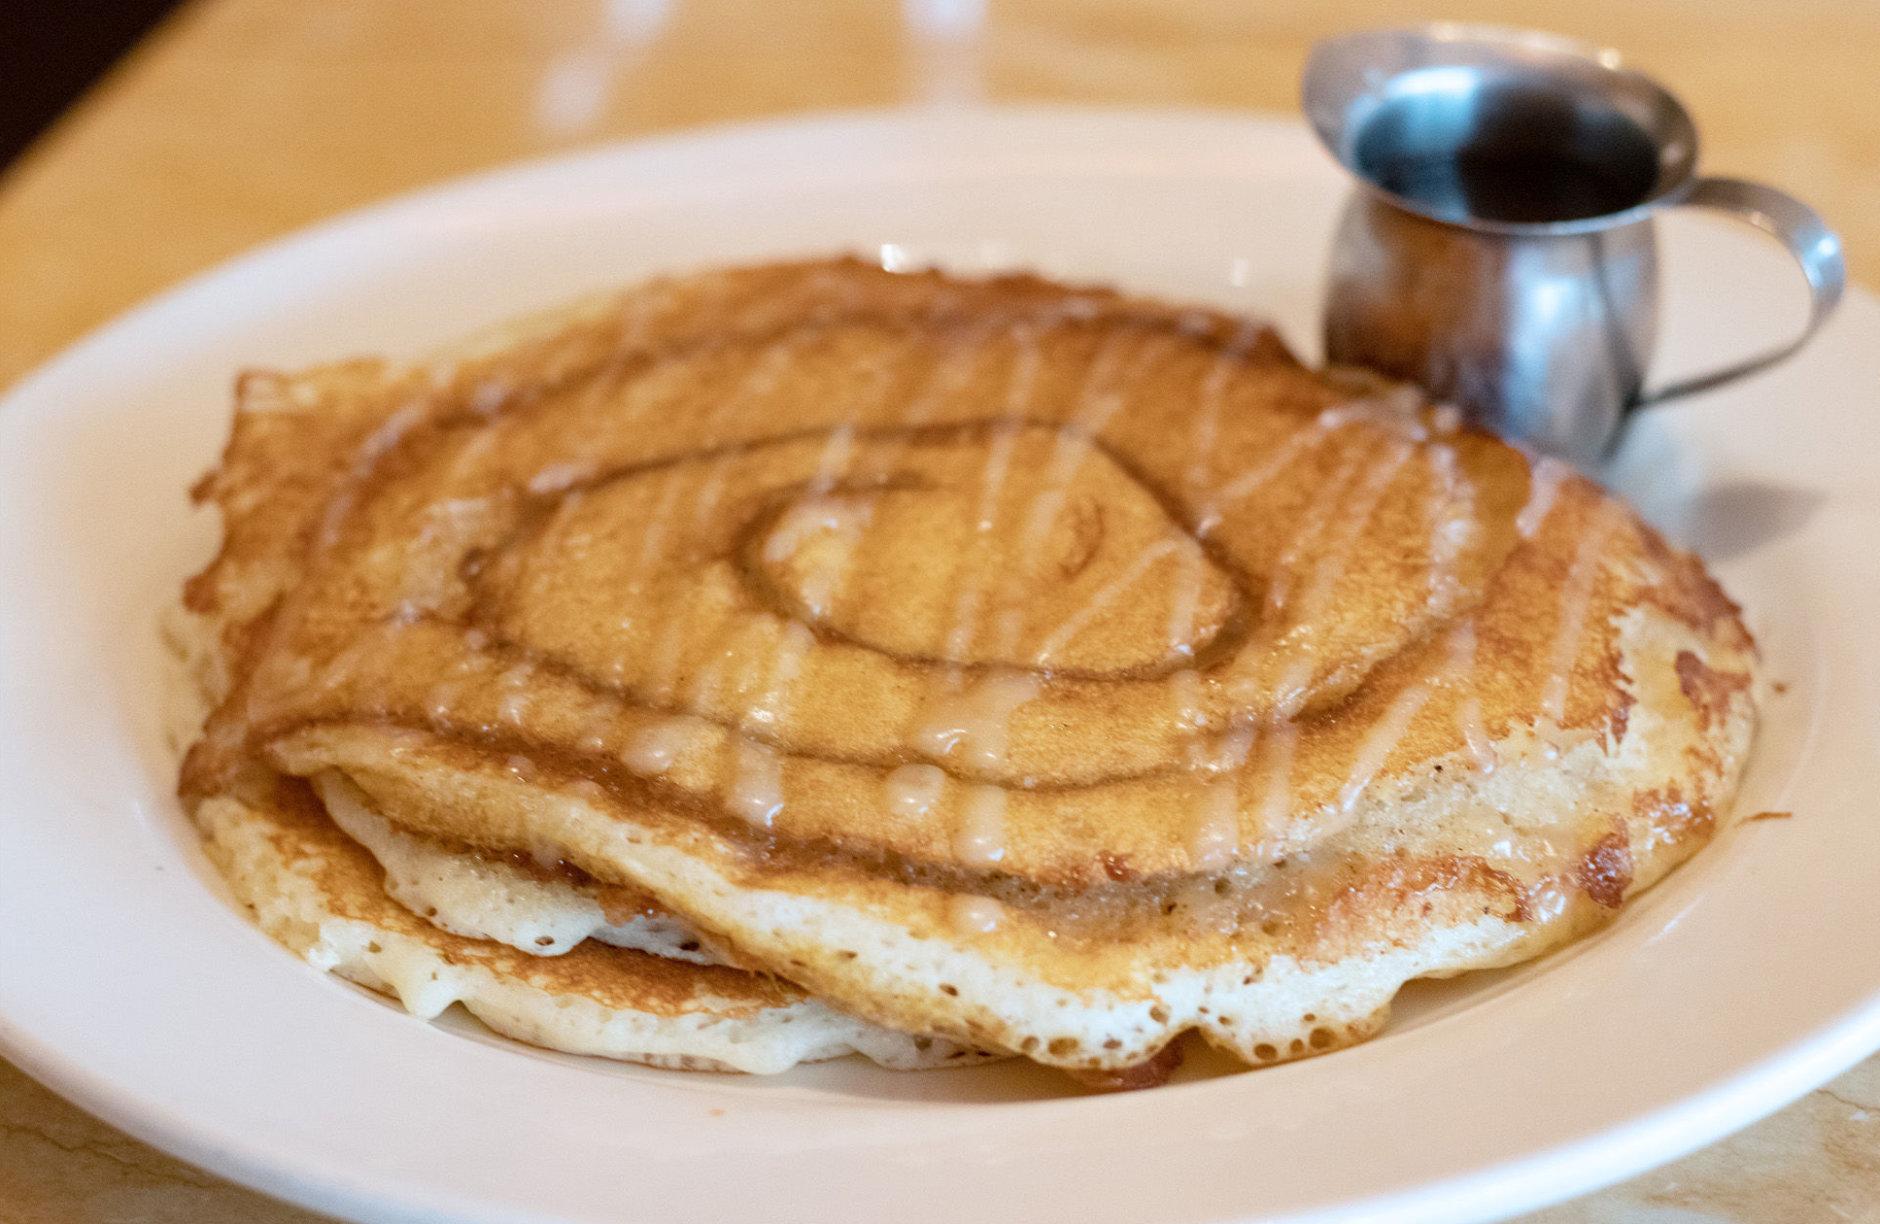 Cheesecake Factory's Cinnamon Roll Pancakes